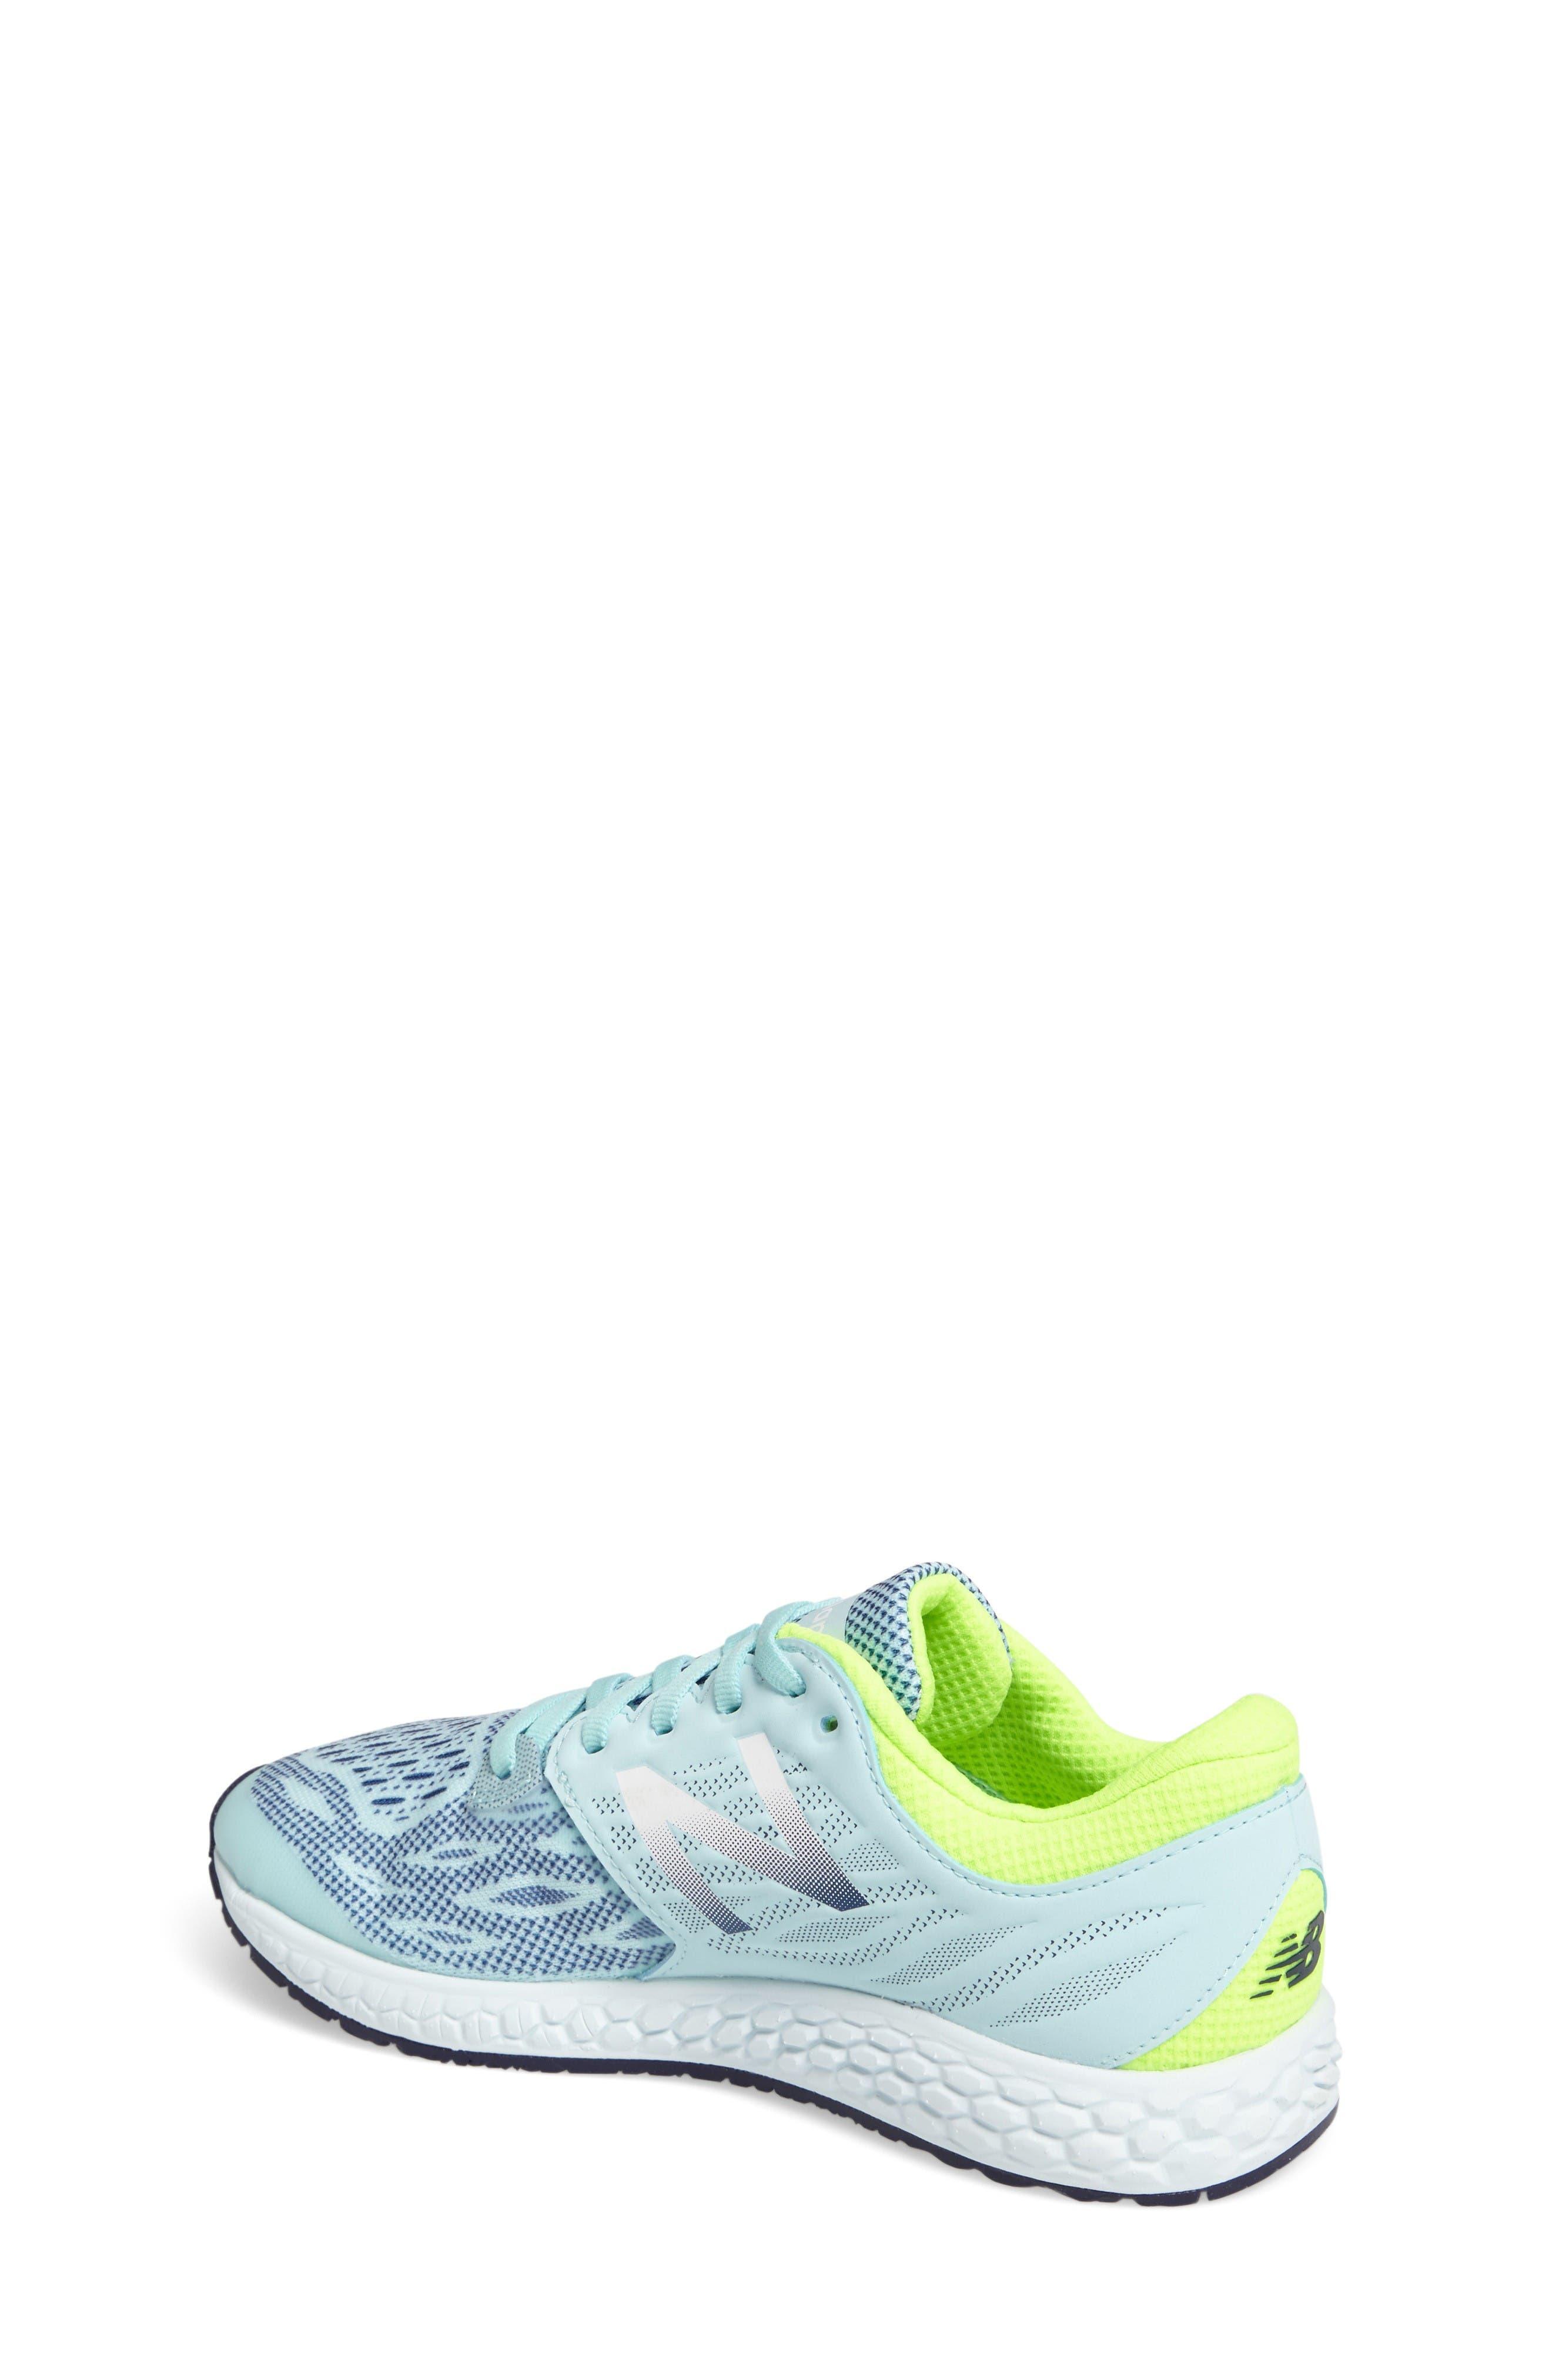 Fresh Foam Sneaker,                             Alternate thumbnail 2, color,                             Teal/Green